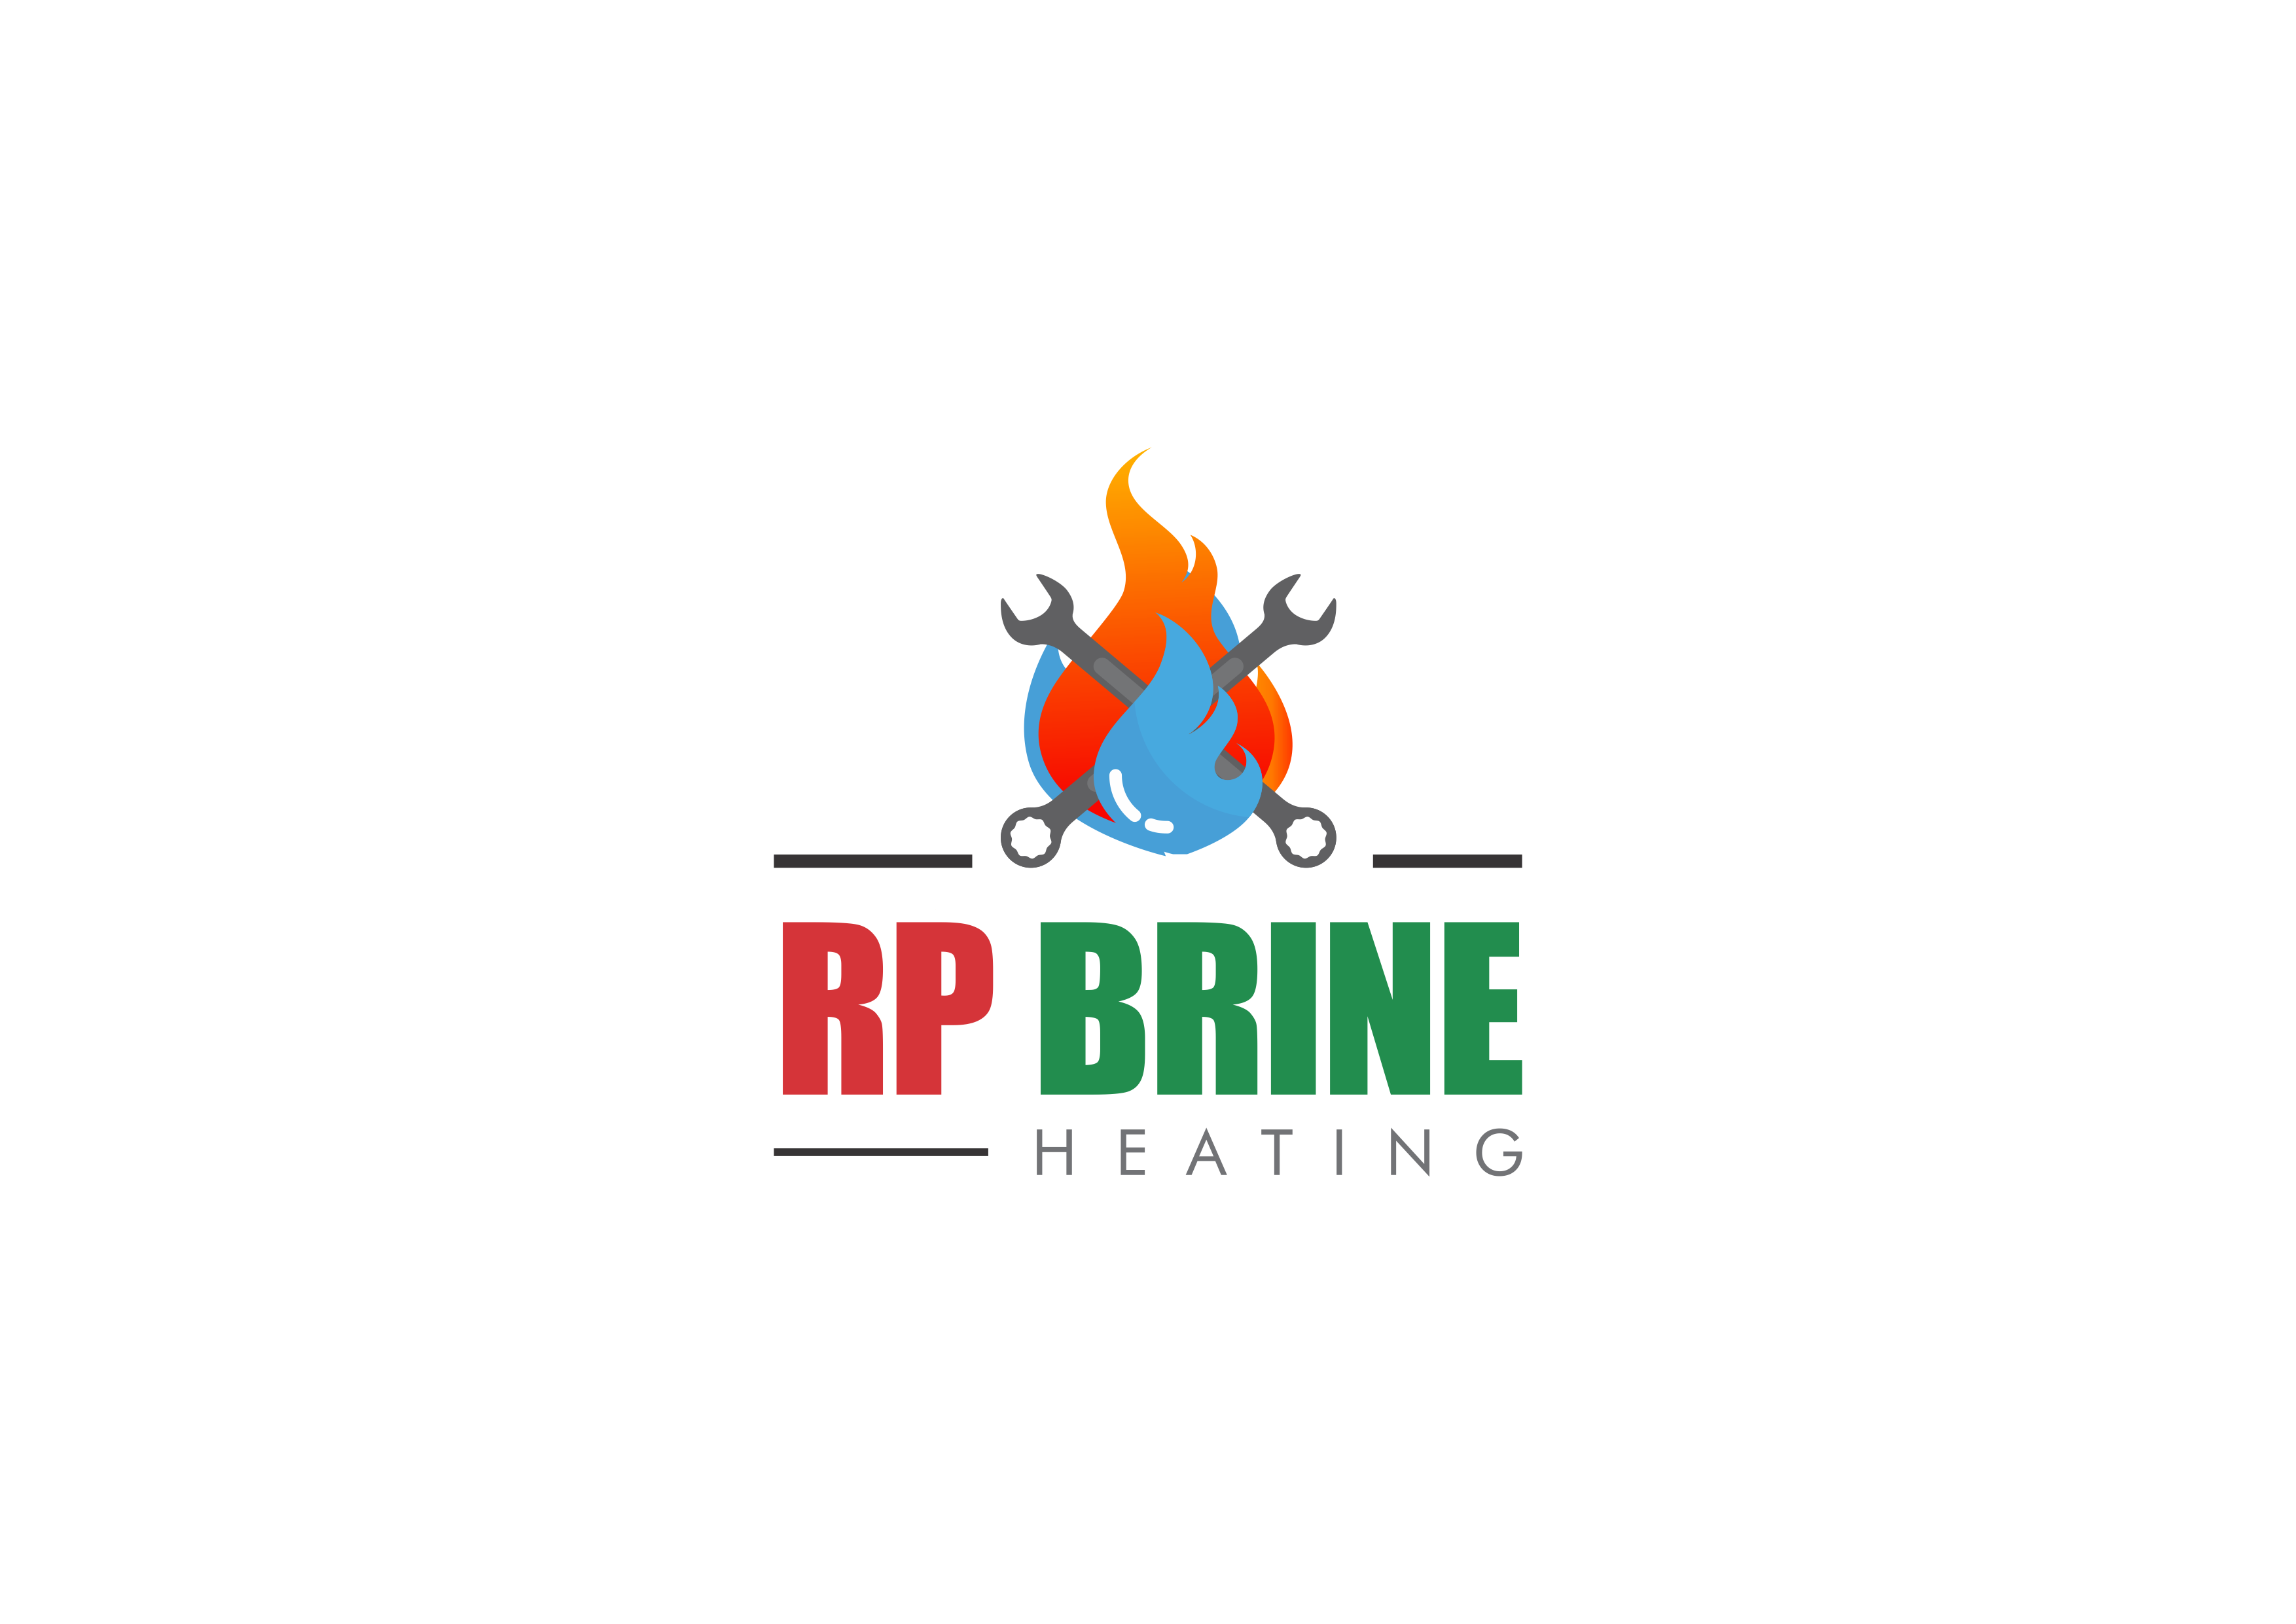 RP Brine Heating Verified Logo